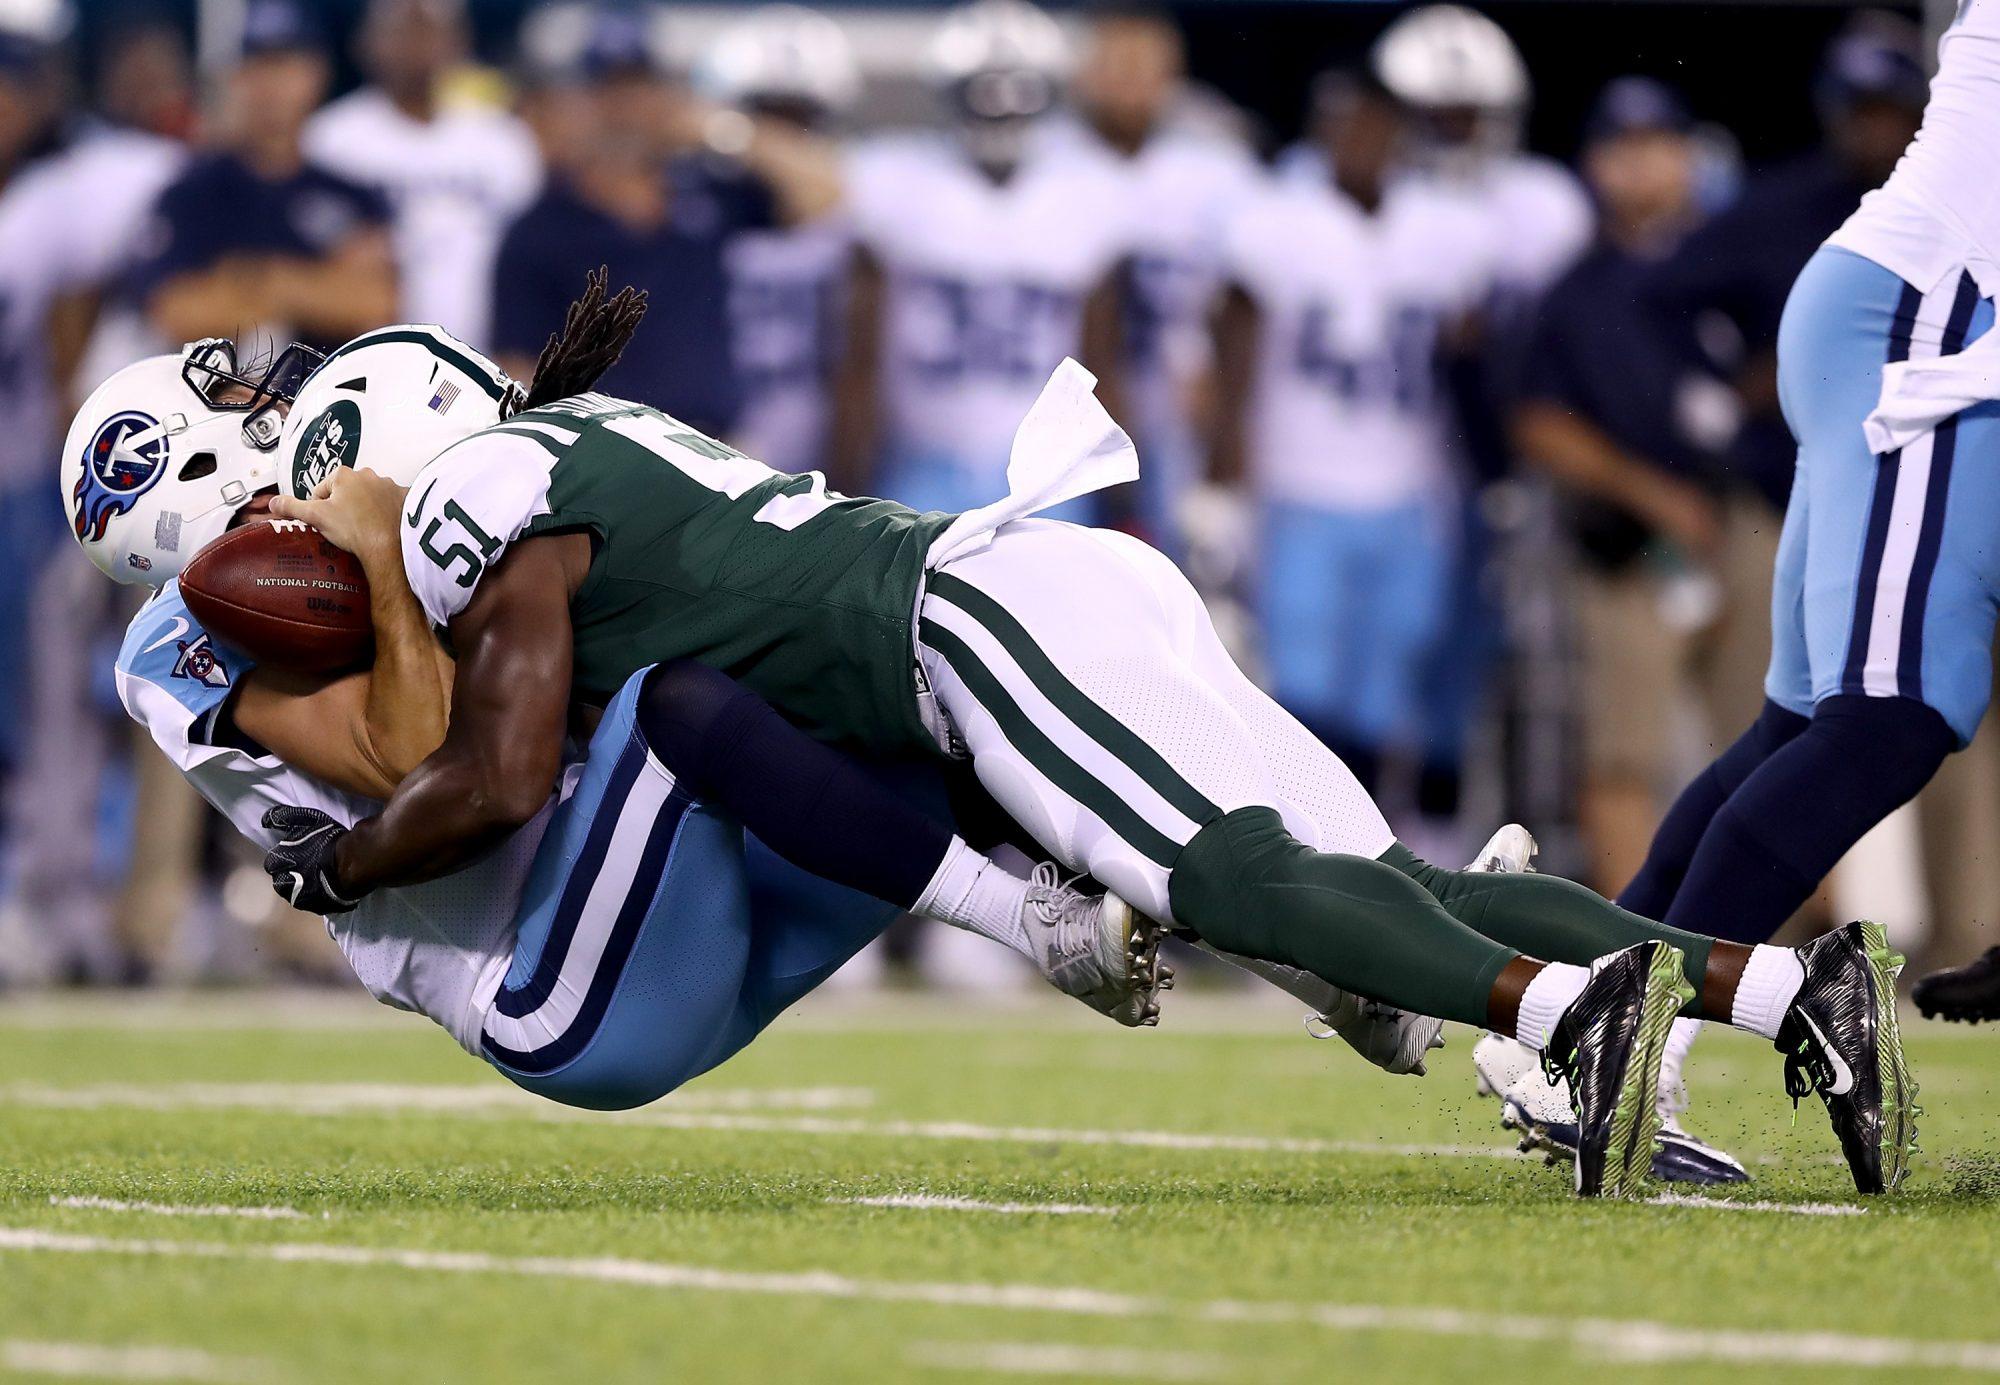 New York Jets Preseason Week 1: Christian Hackenberg Solid, No Harris & Revis=Fast Defense (Highlights) 1